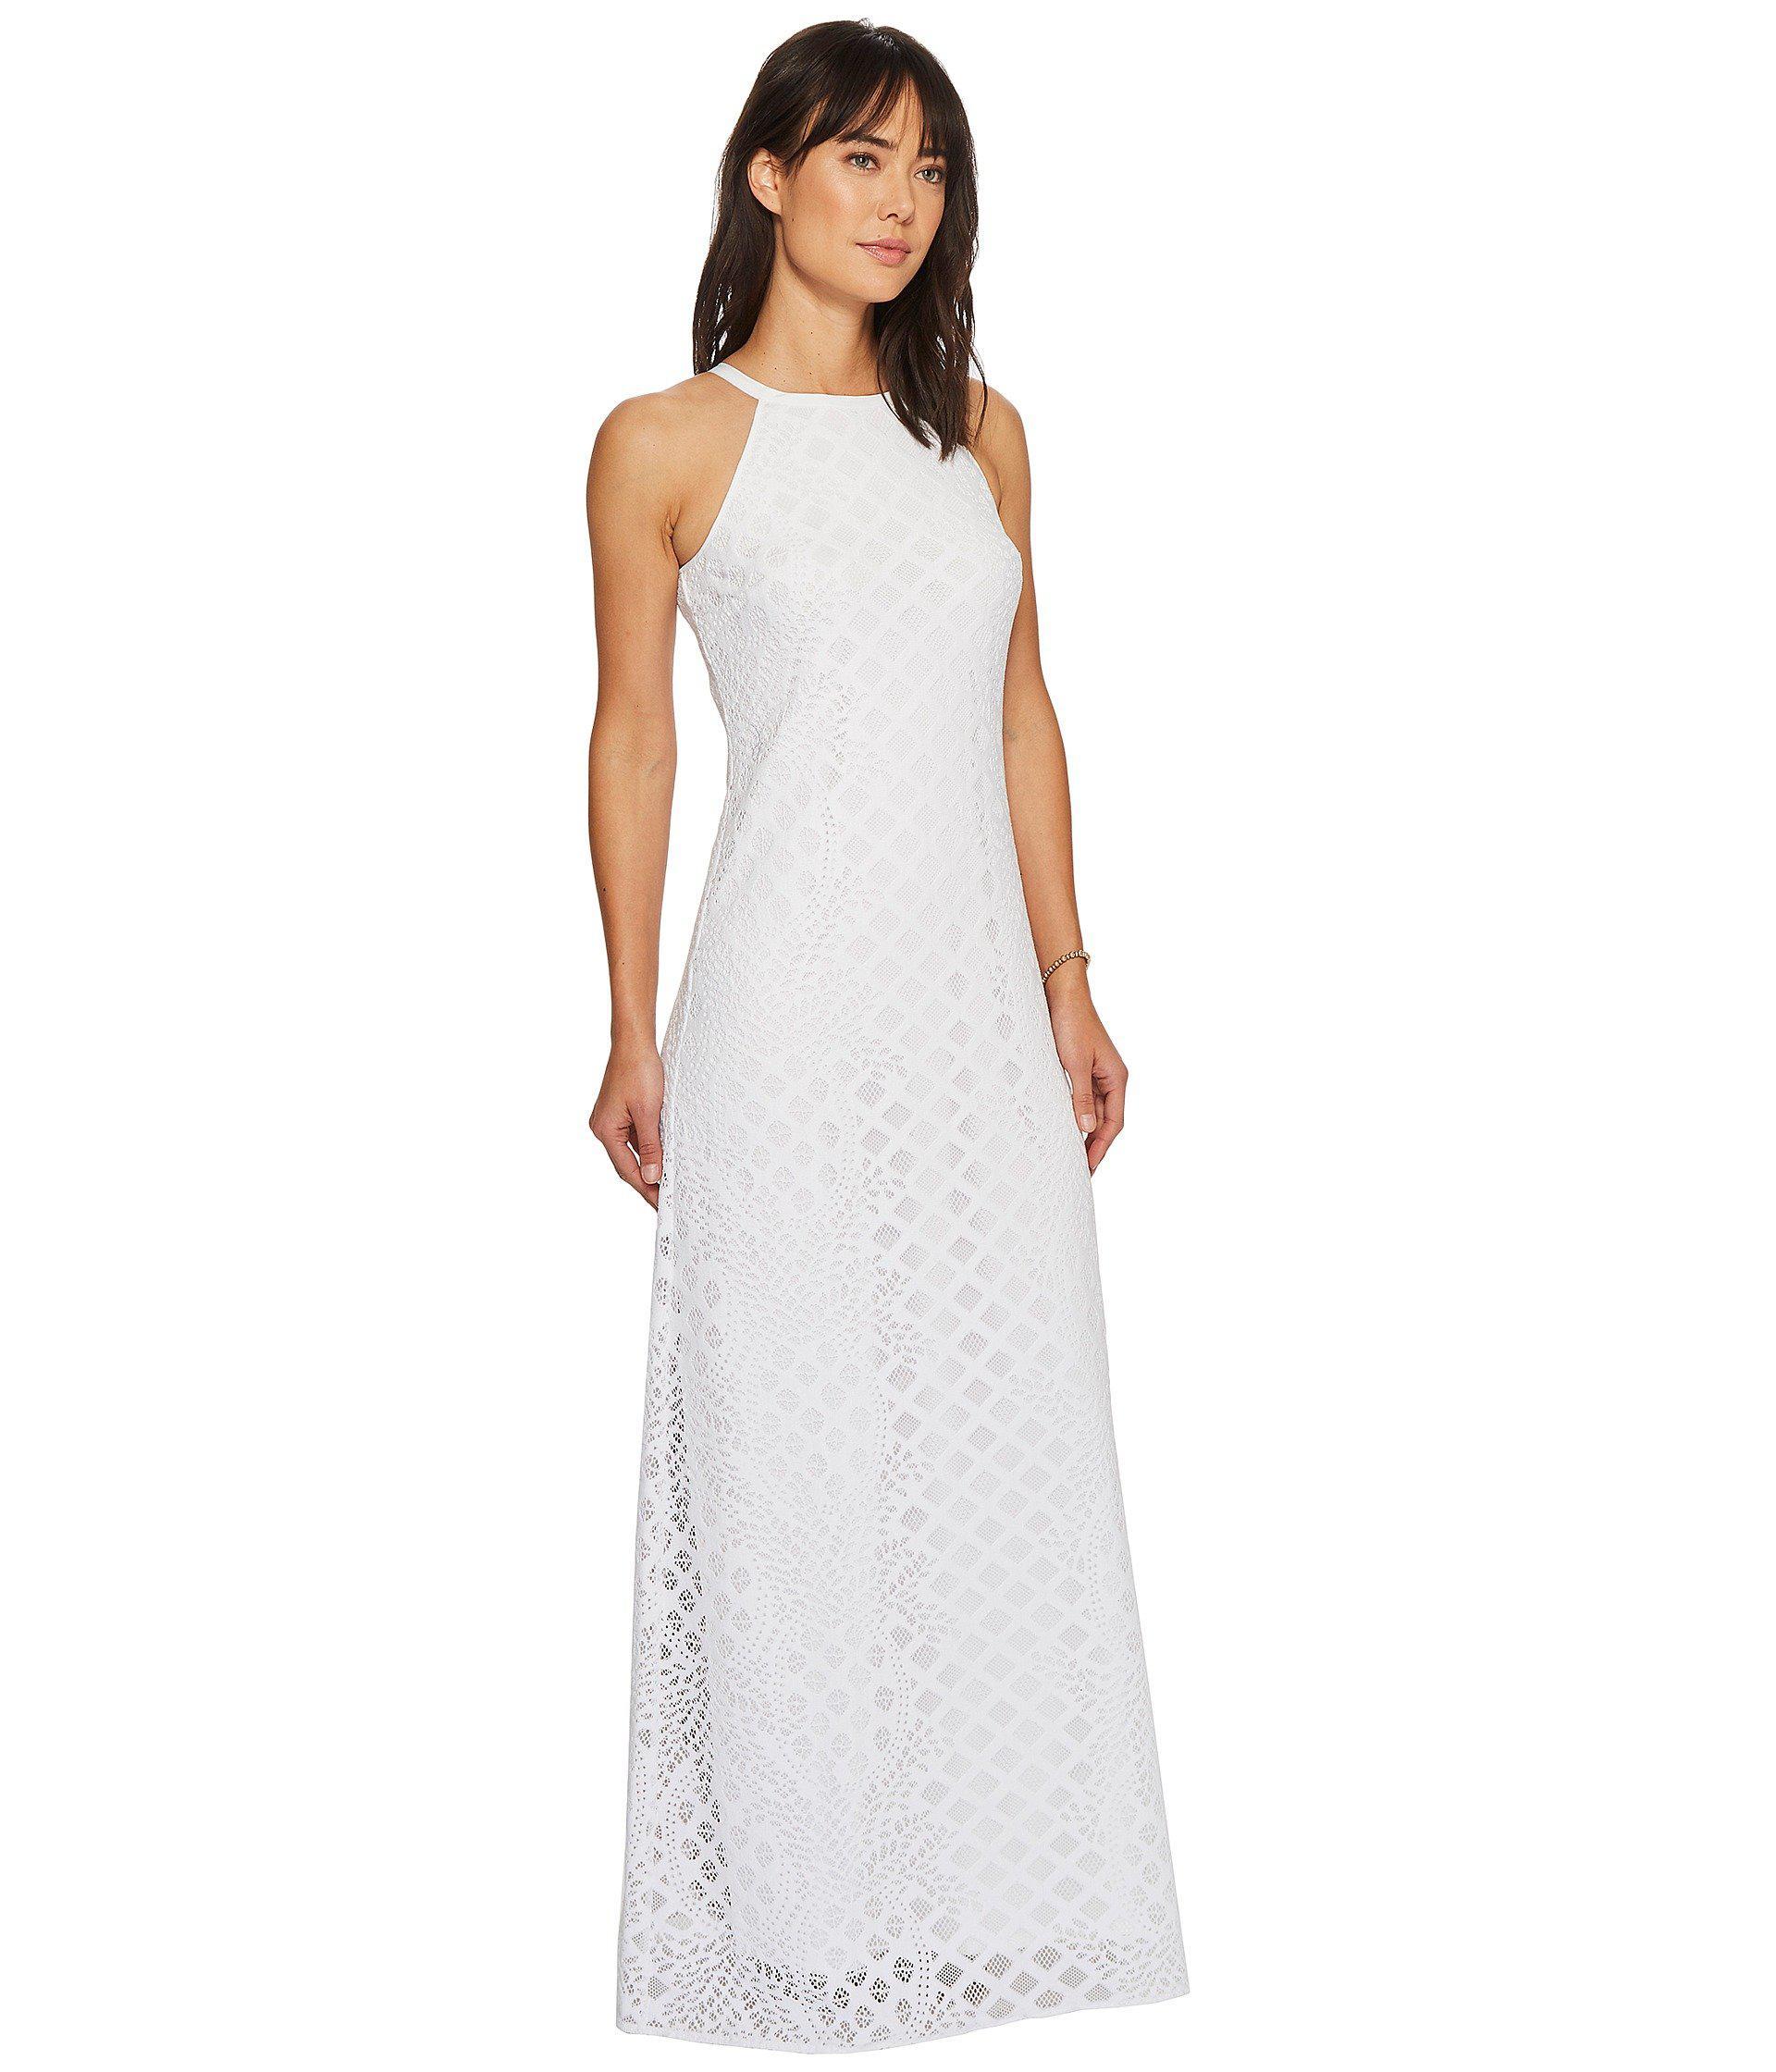 Lyst Lilly Pulitzer Pearl Maxi Dress Resort White Pineapple Geo